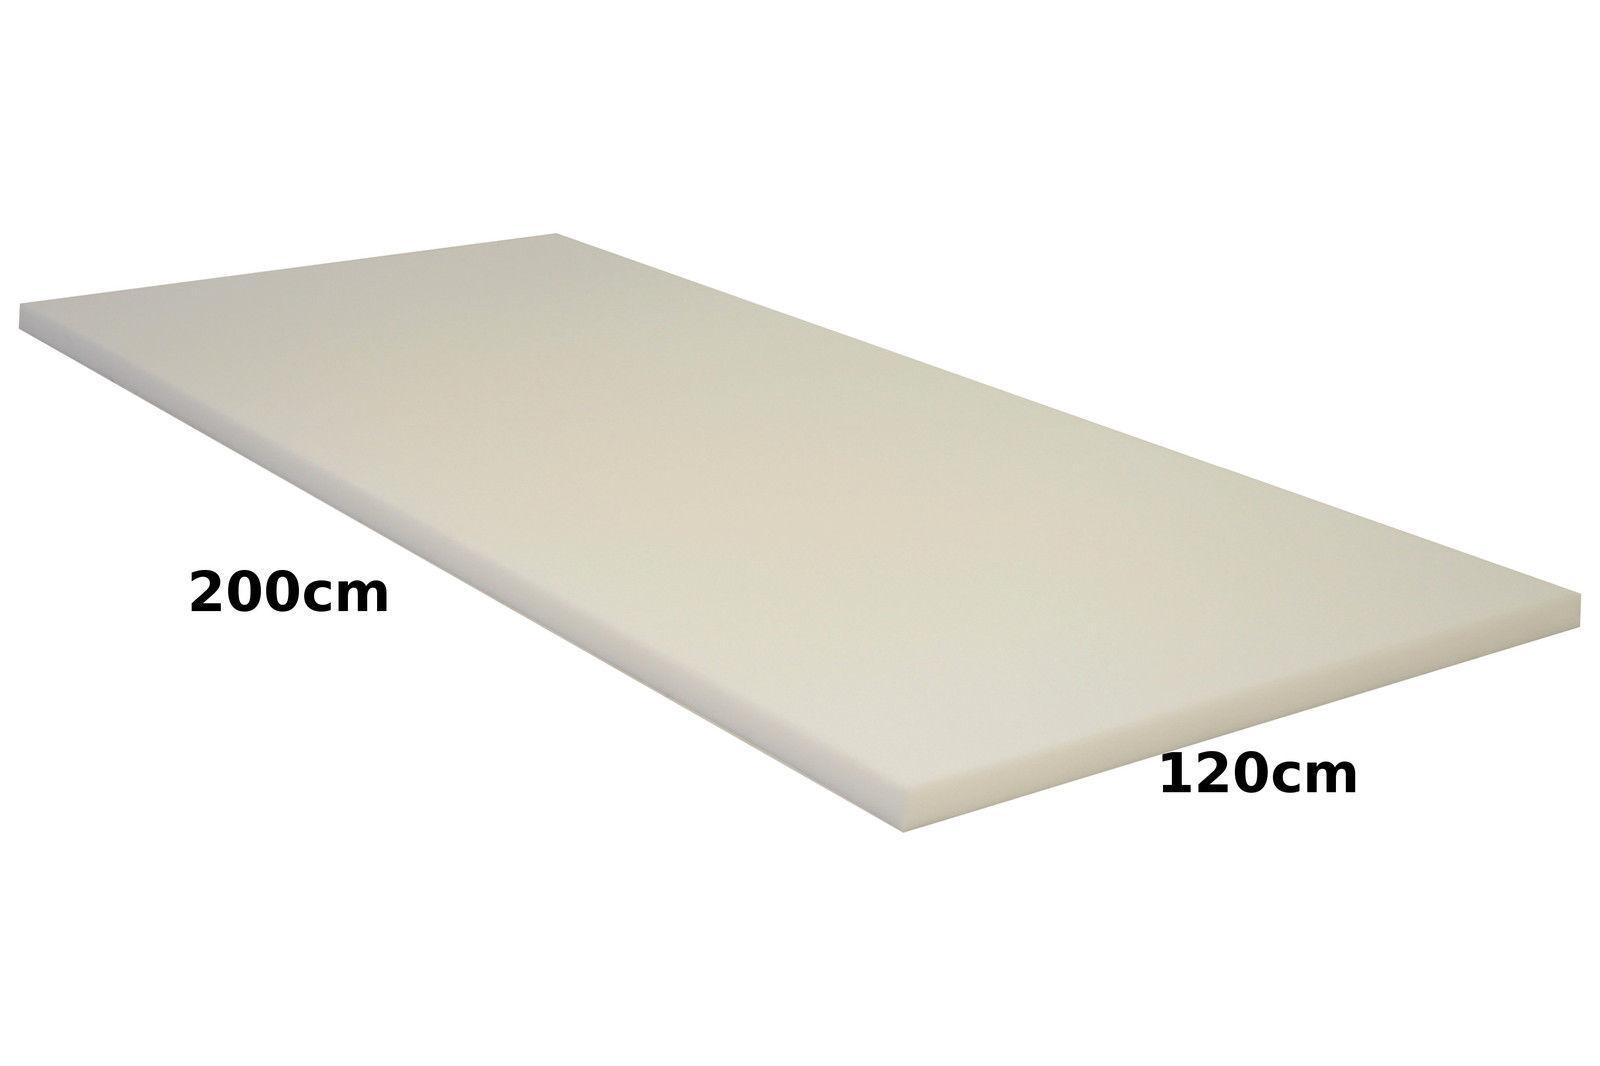 Schaumstoff Schaumstoffpolster Schaumstoffplatte Polster Polster Polster 120x200x9cm RG 35 43 2d789d